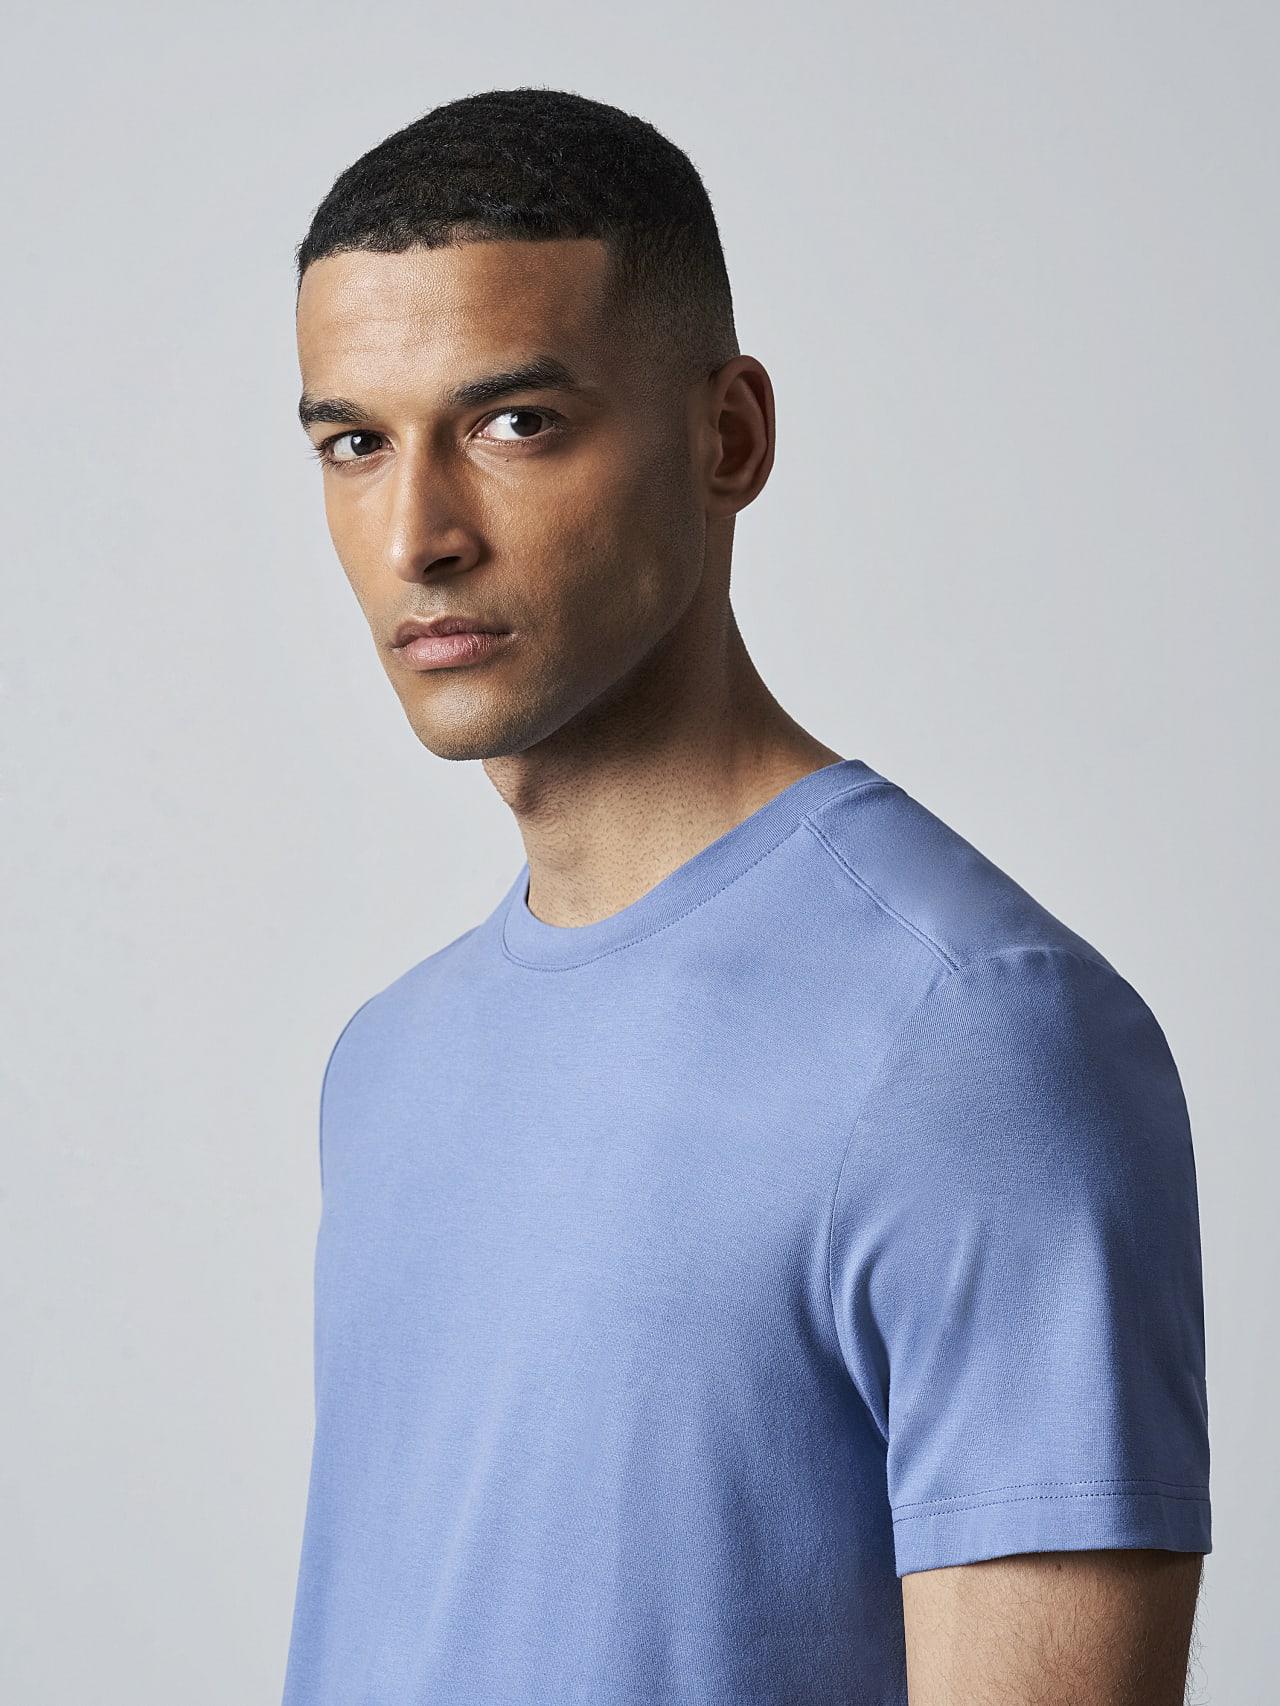 JANUE V1.Y5.02 Viscose T-Shirt light blue Right Alpha Tauri